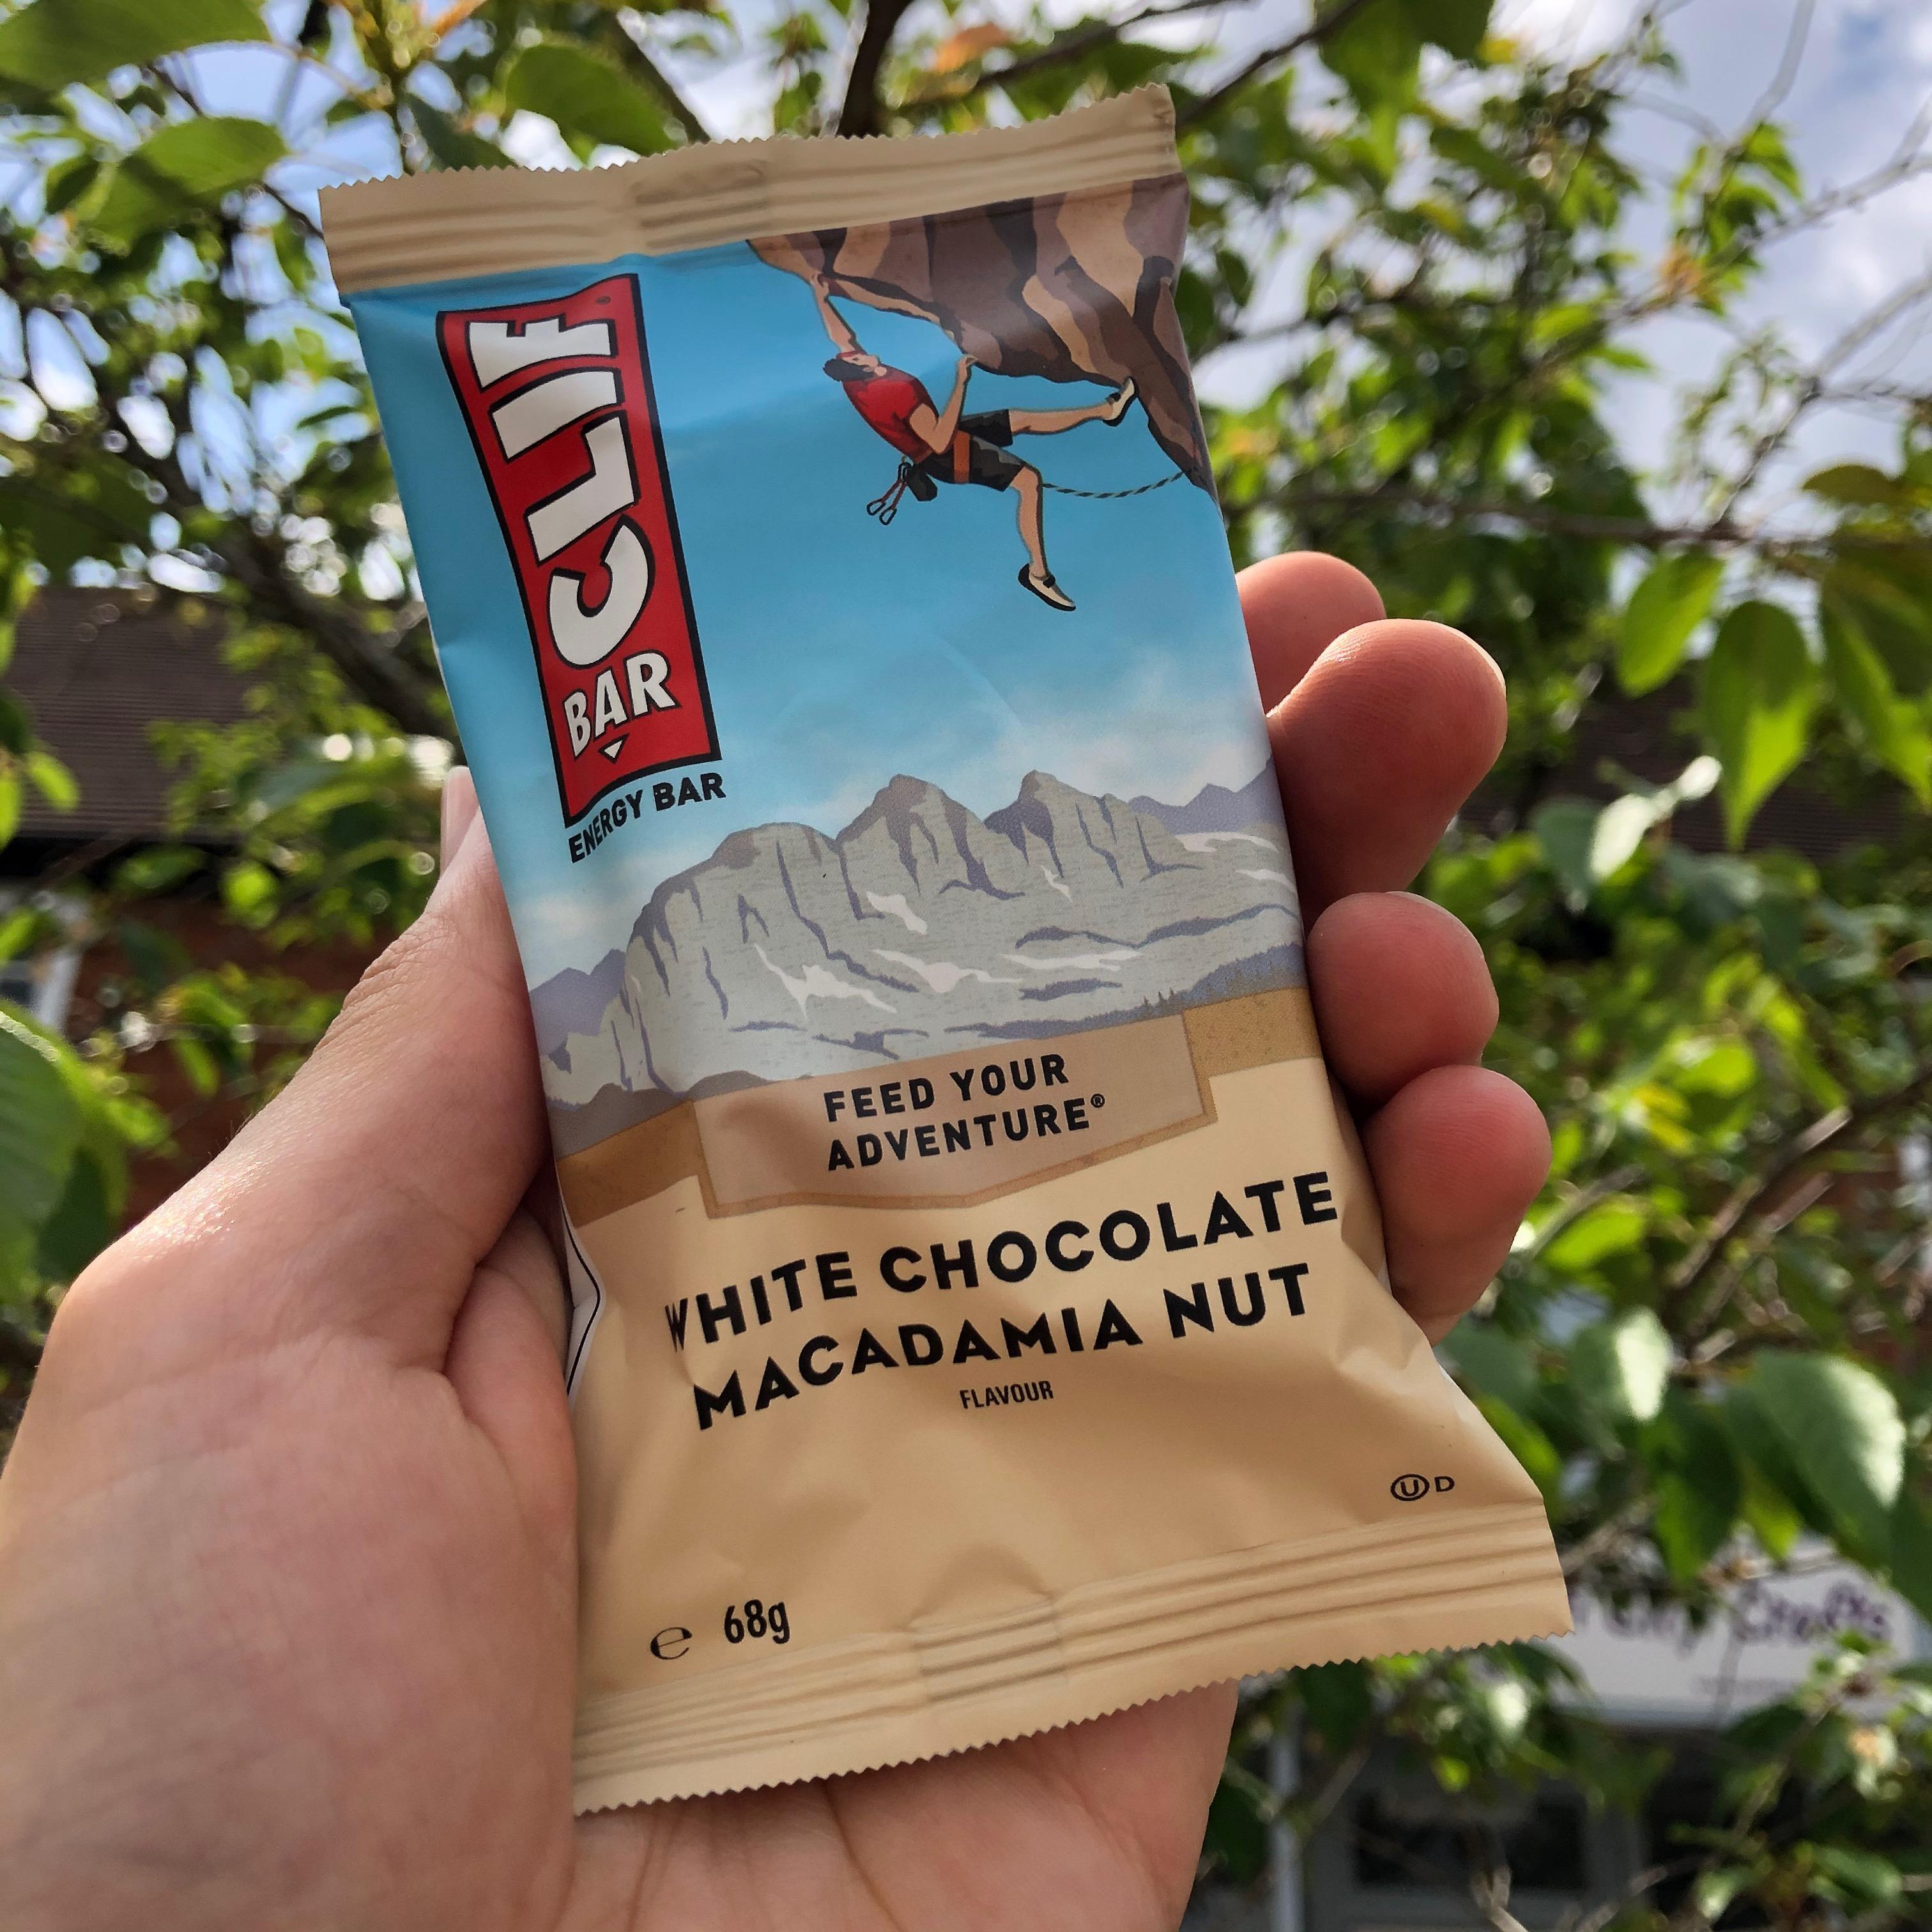 Clif White Chocolate Macadamia Energy Bar